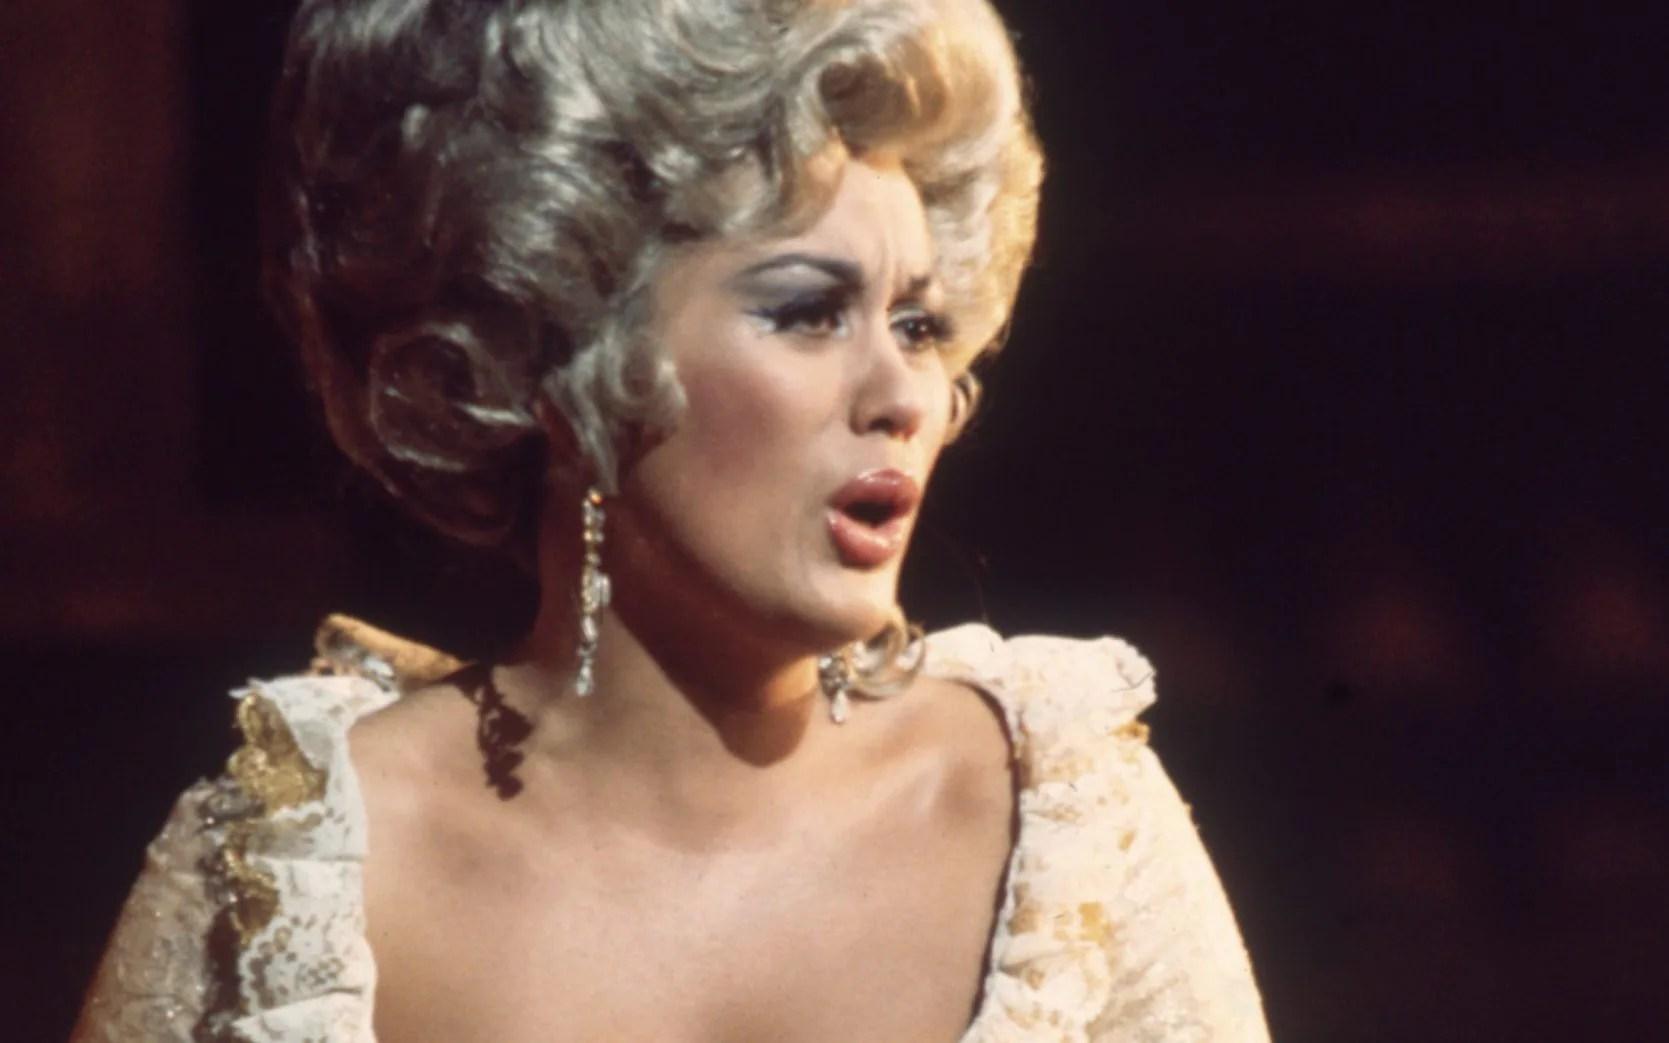 Te Kanawa as the Countess in Mozart's opera Le Nozze di Figaro at the Royal Opera House in 1970